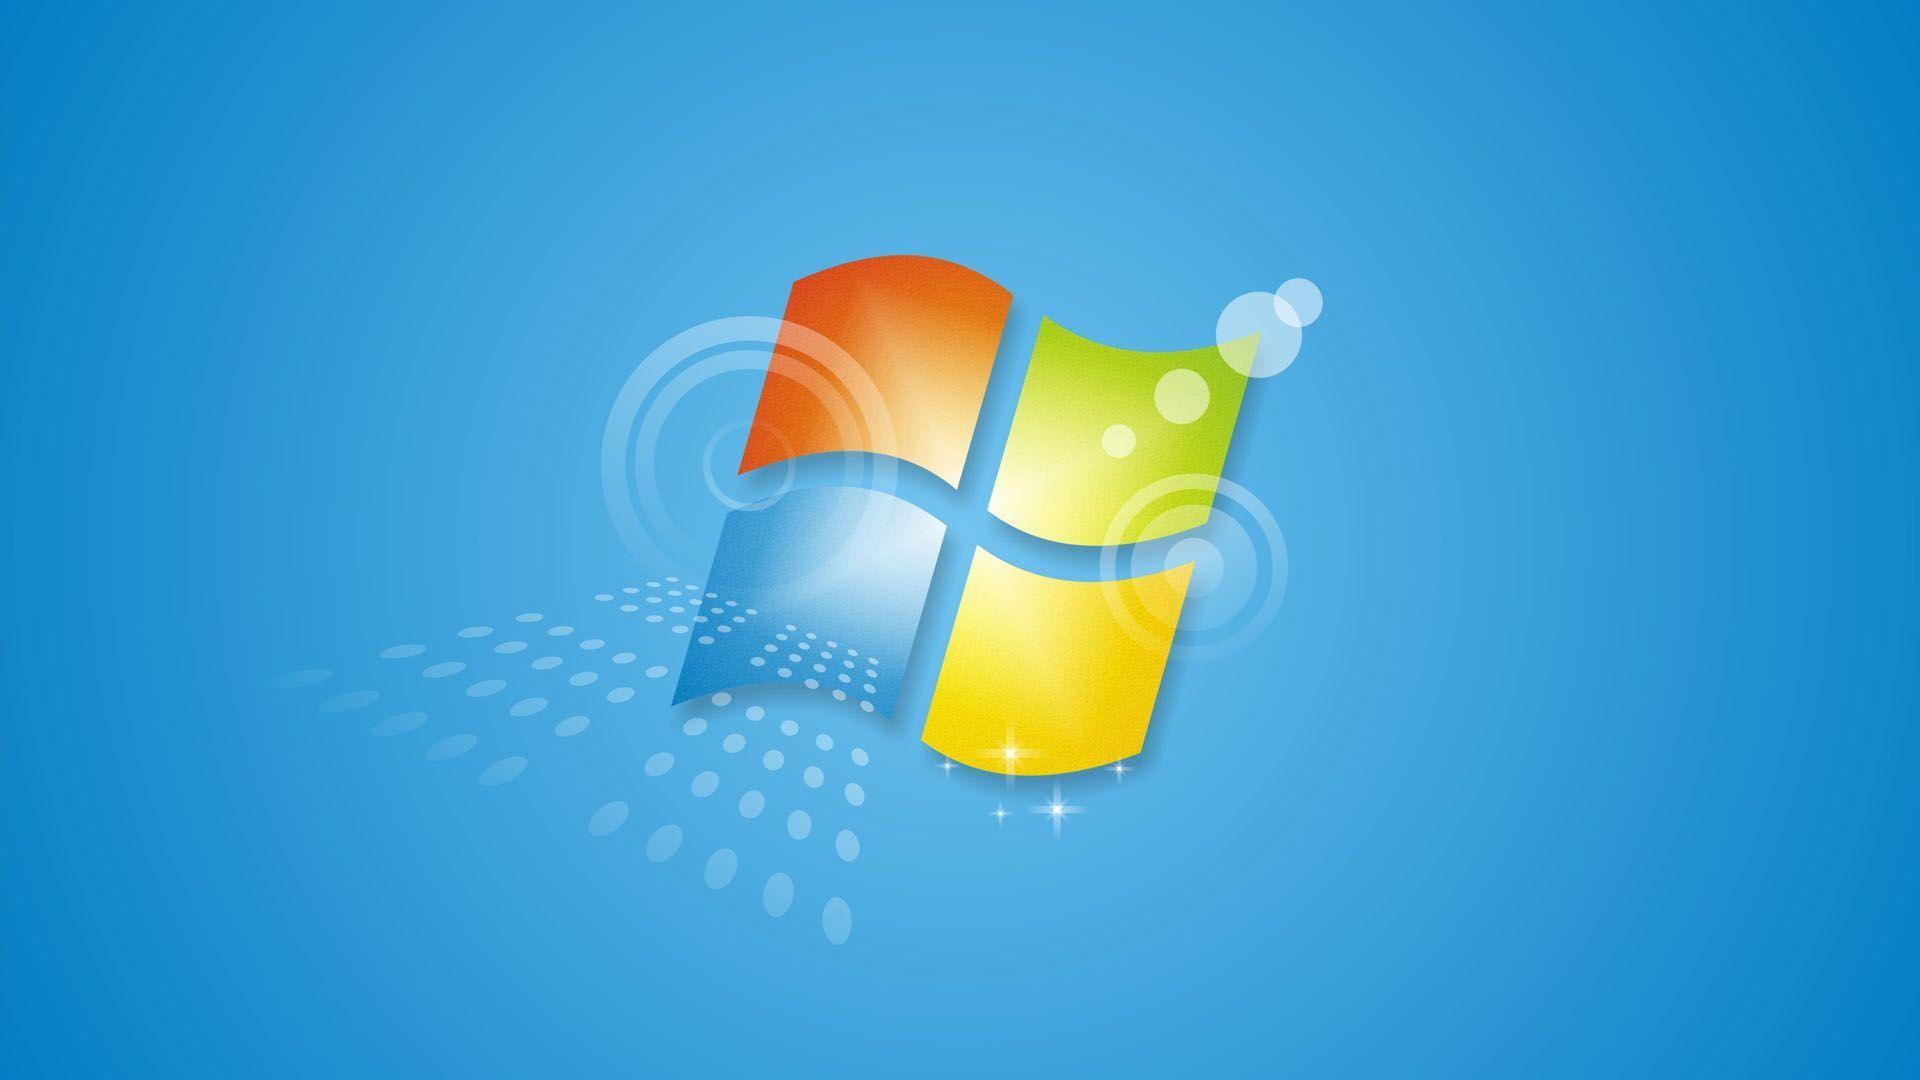 windows 7 default wallpapers - sf wallpaper